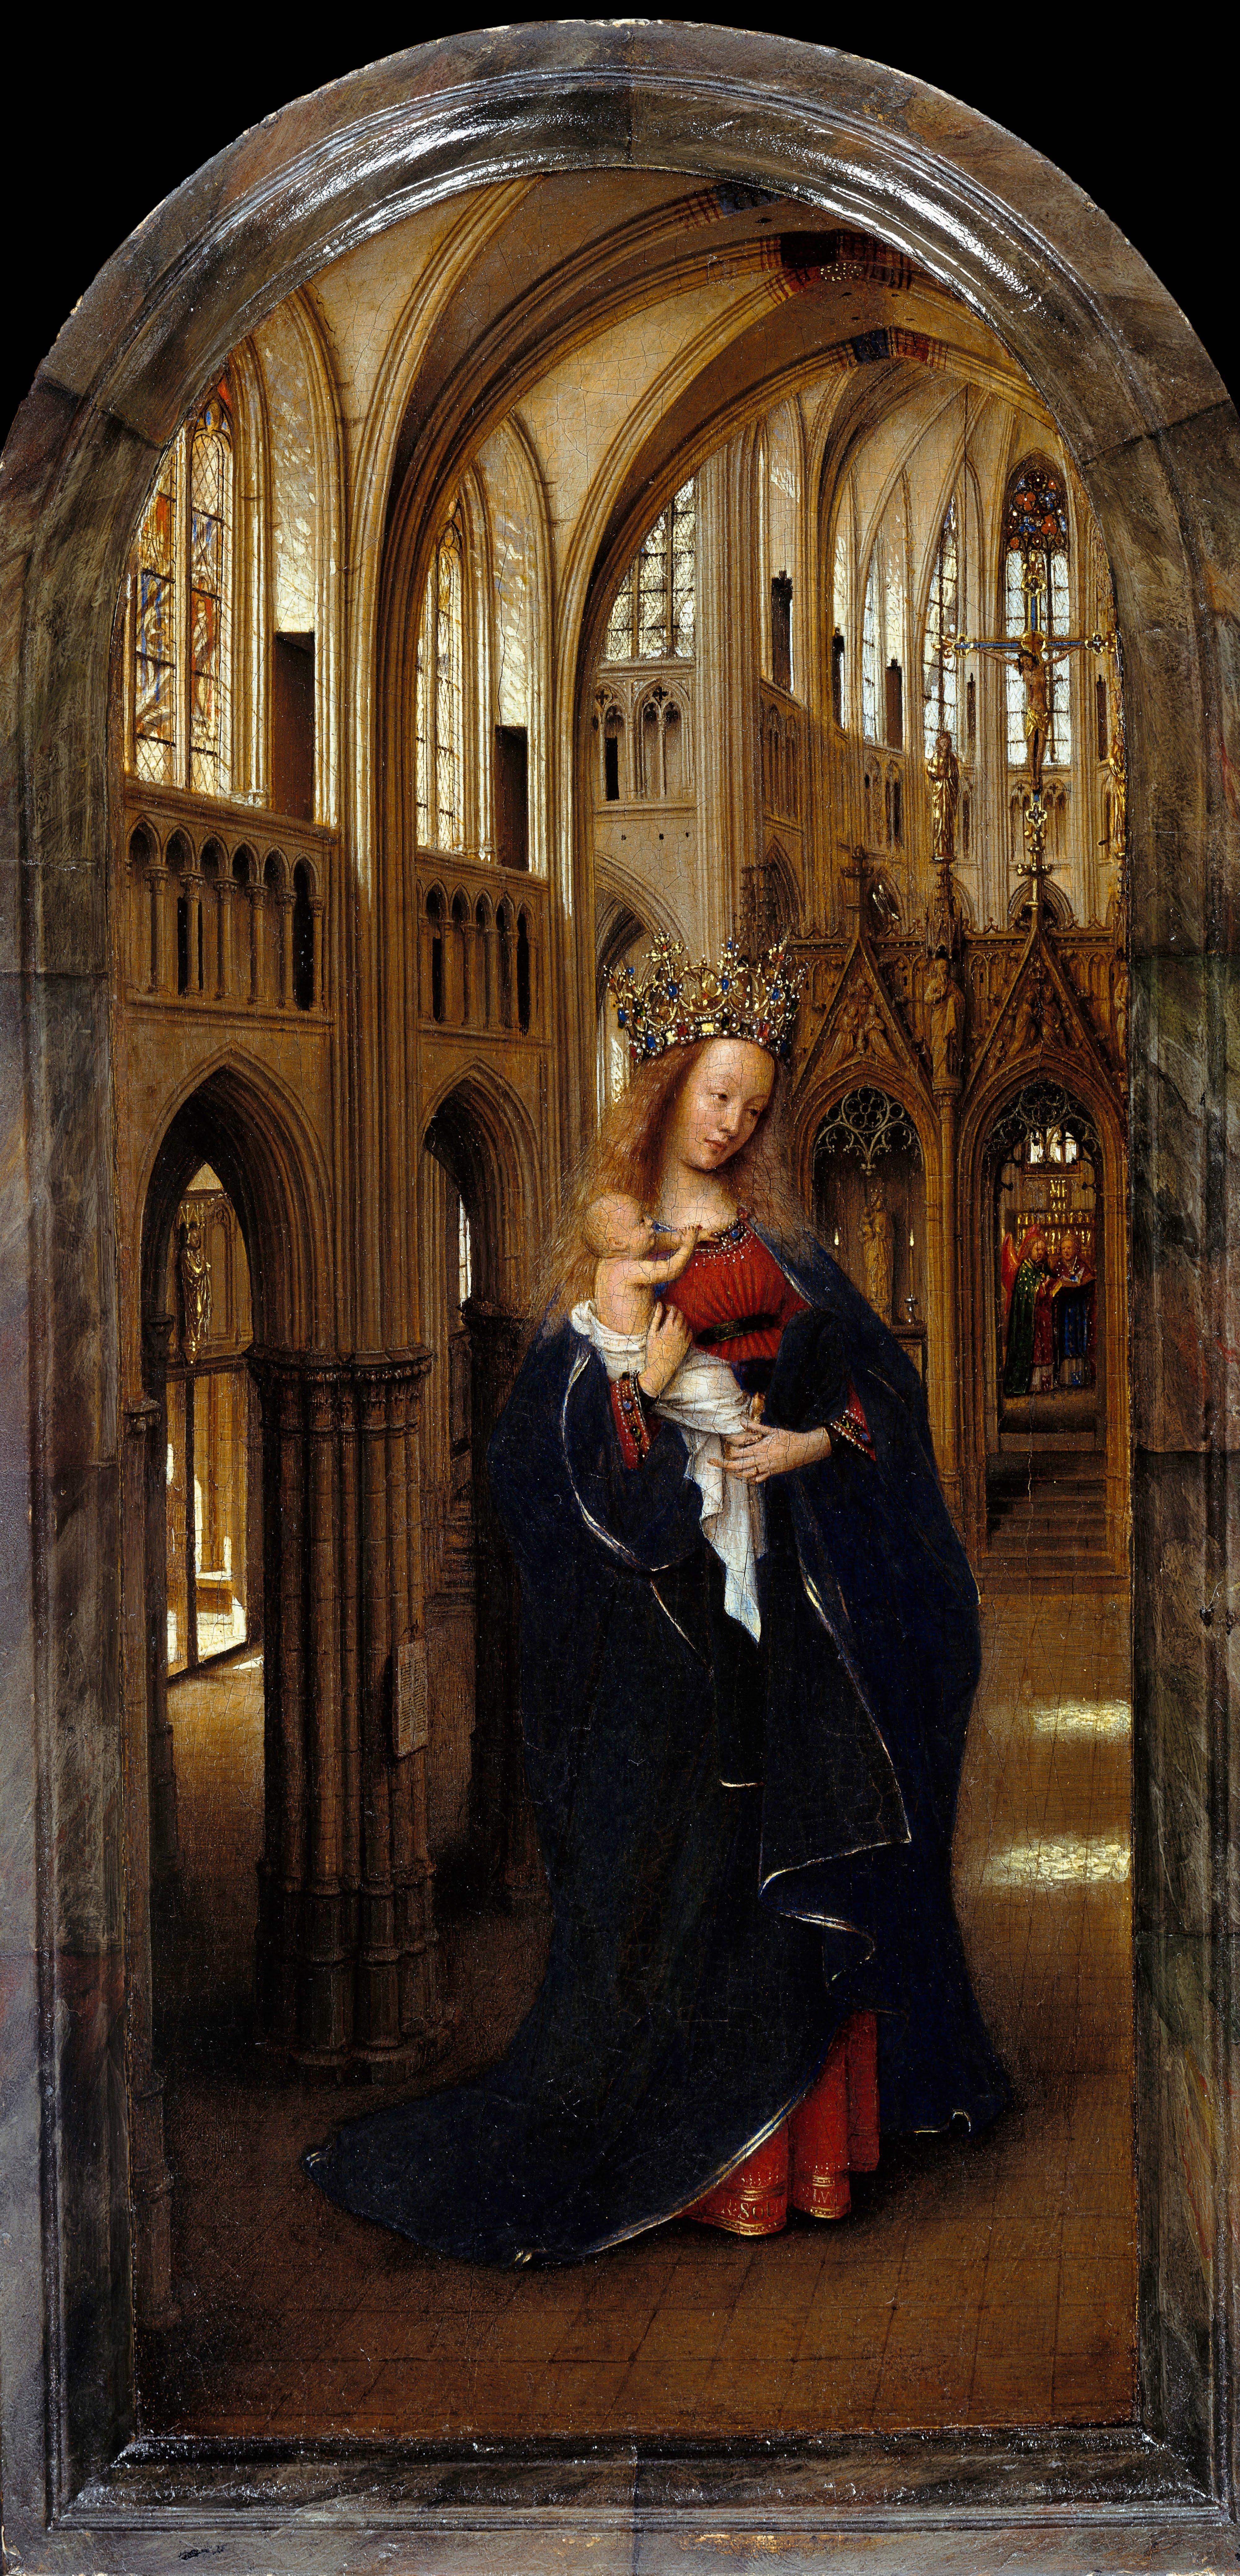 Jan Van Eyck: La Virgen en una iglesia. Gemäldegalerie, Berlín.